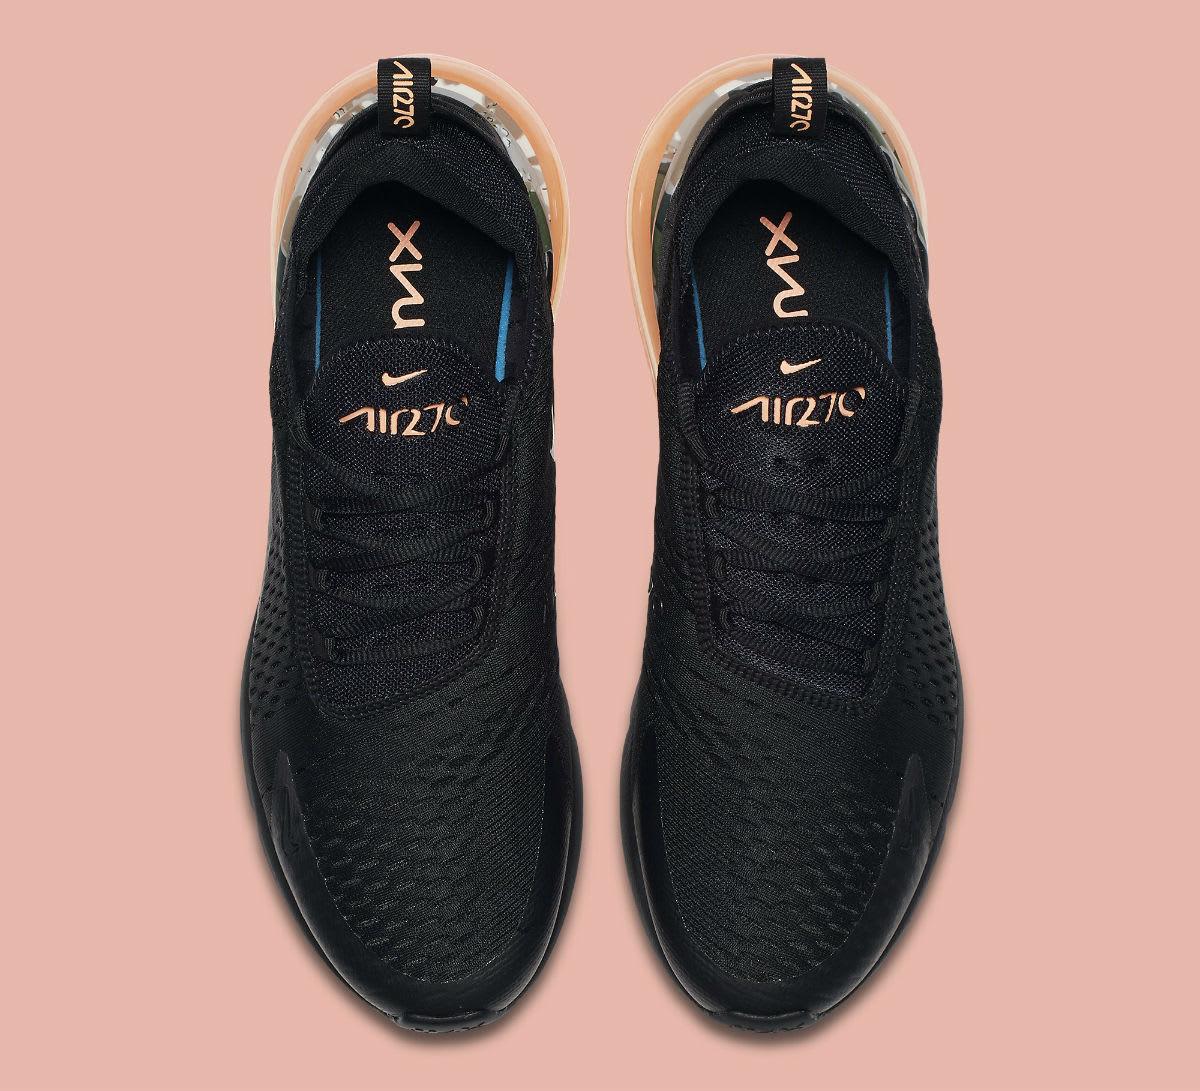 Nike Air Max 270 Sunset Tint Camo Heel Release Date AQ6239-001 Top